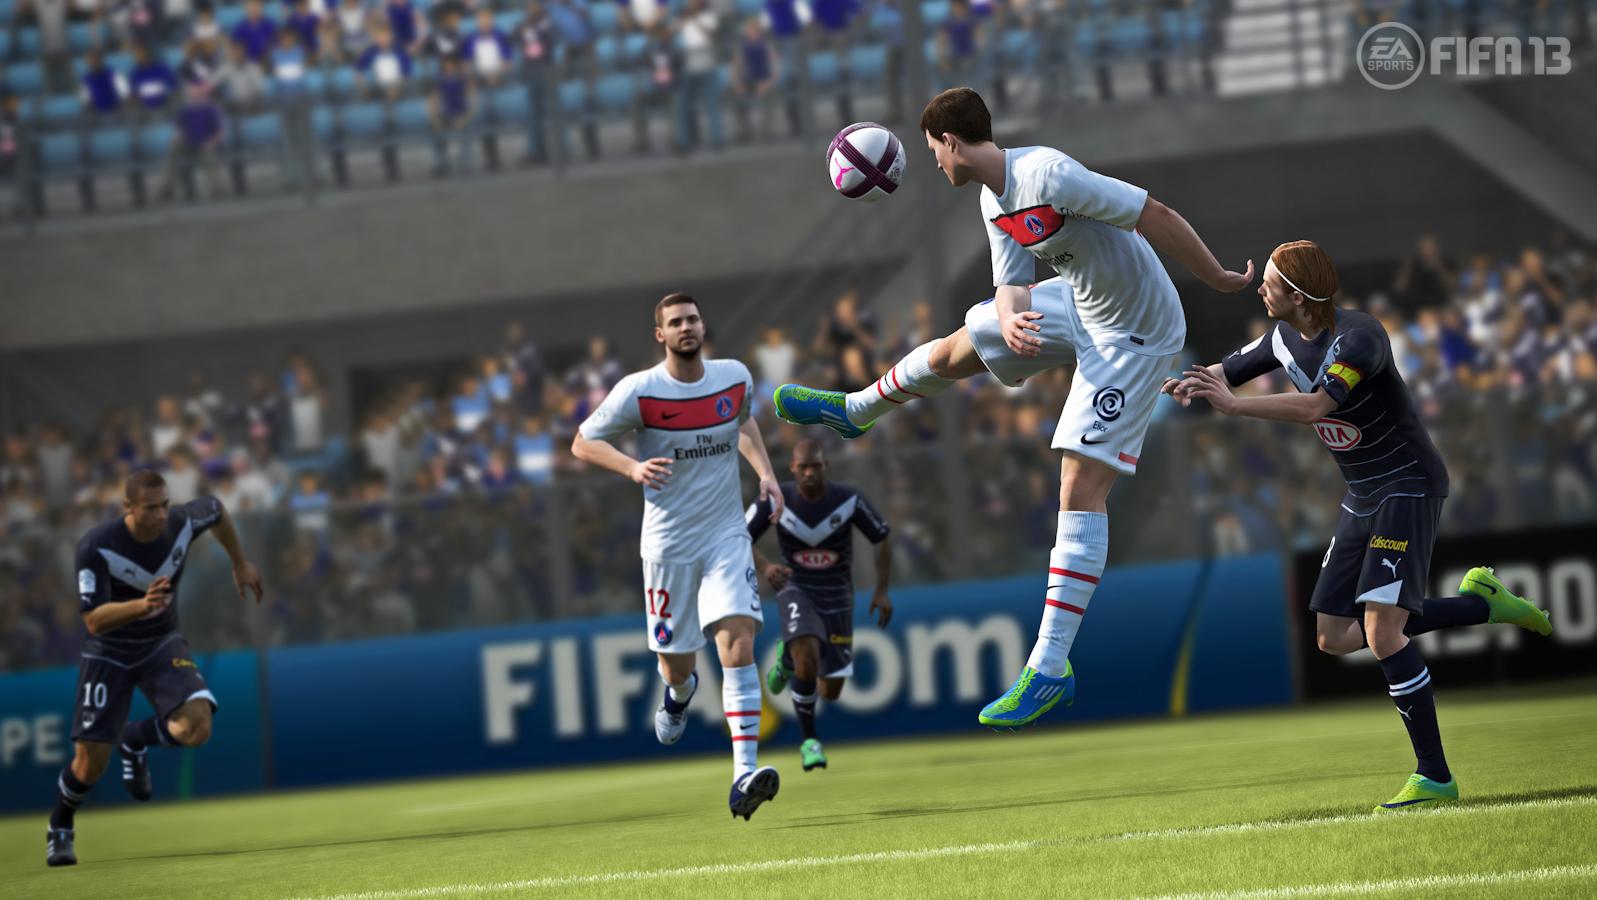 Primeras impresiones de FIFA 13 [Cabeza de Pelota]